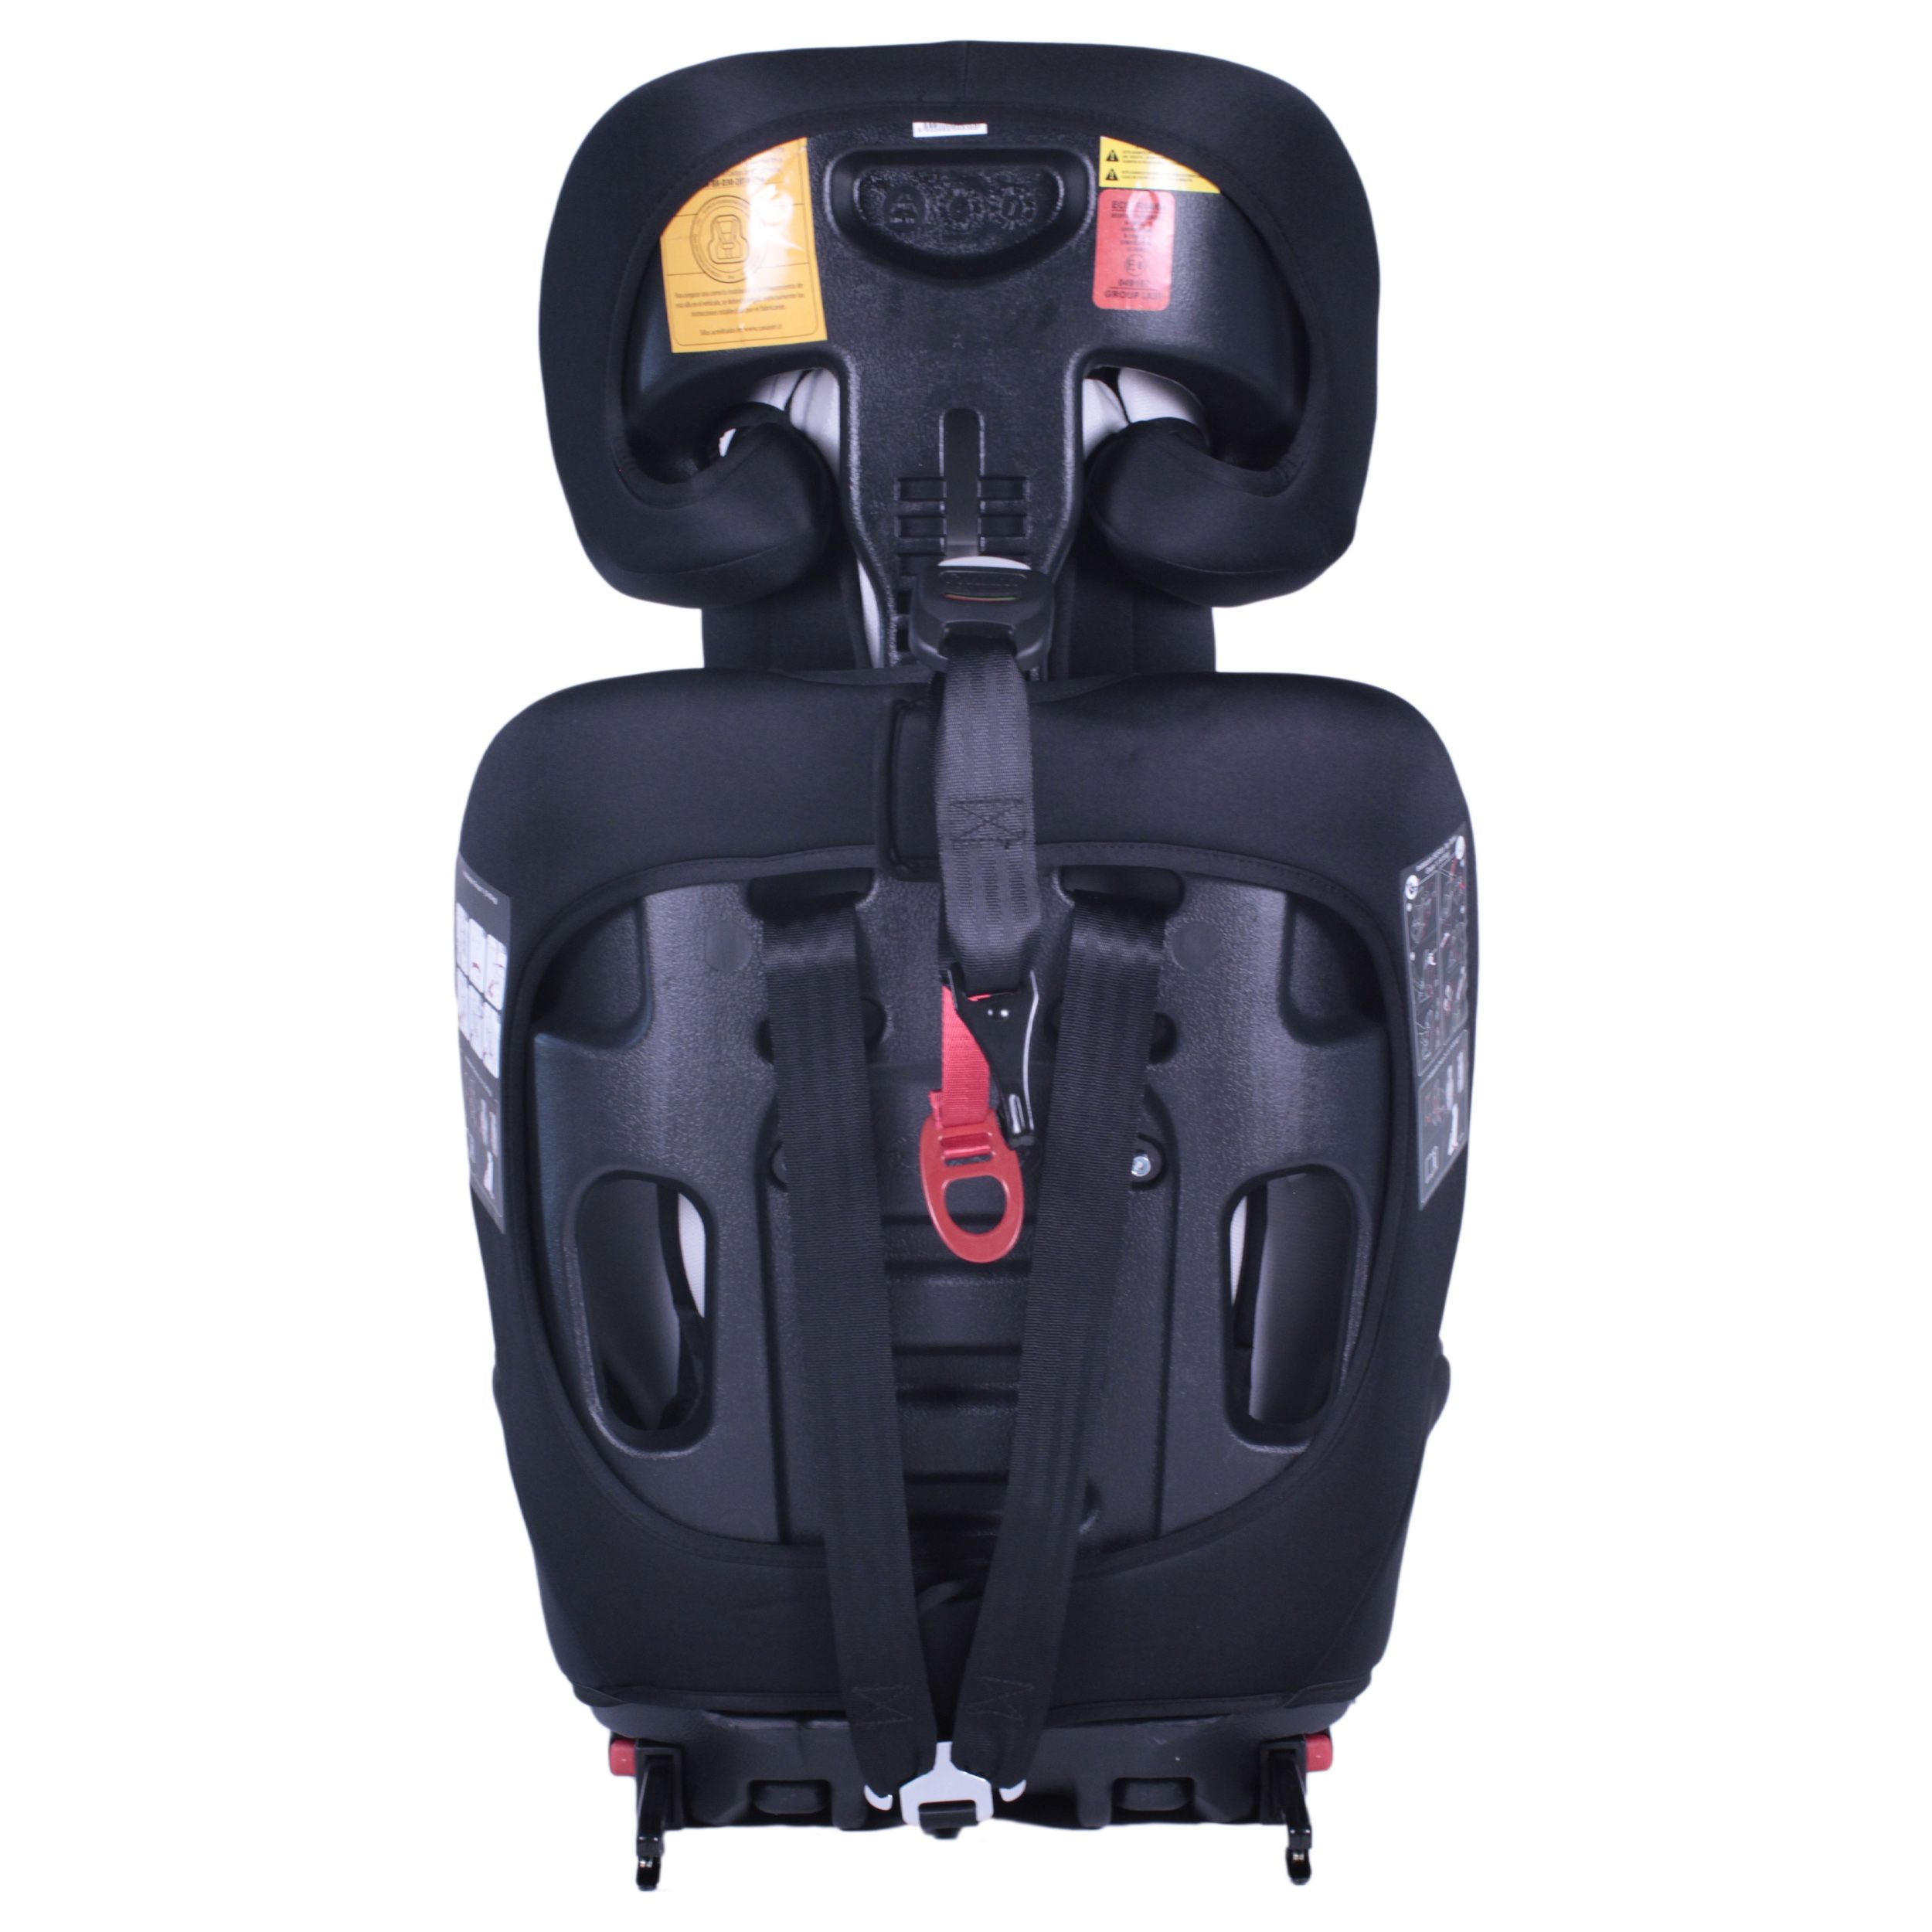 Silla De Auto Isofix Baby Way Turquesa Bw-750T21